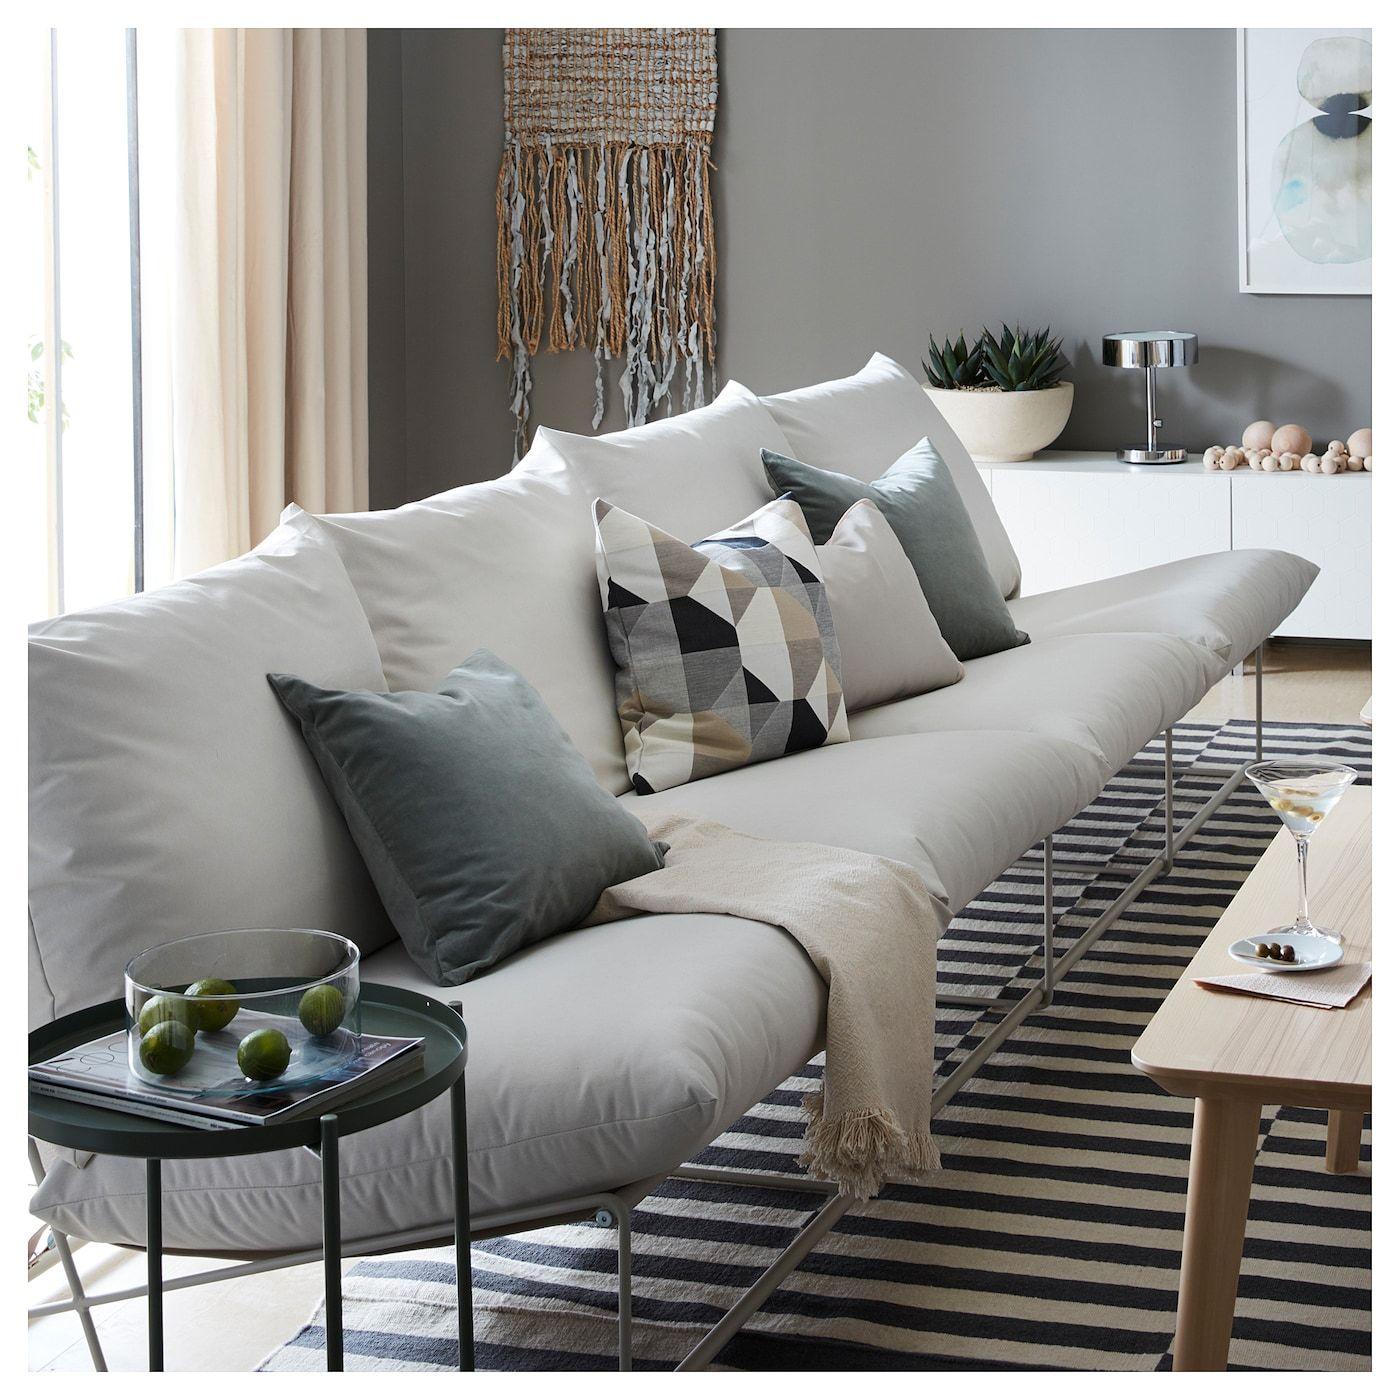 Ikea Havsten 4 Seat Sofa In Outdoor Without Armrests Beige In